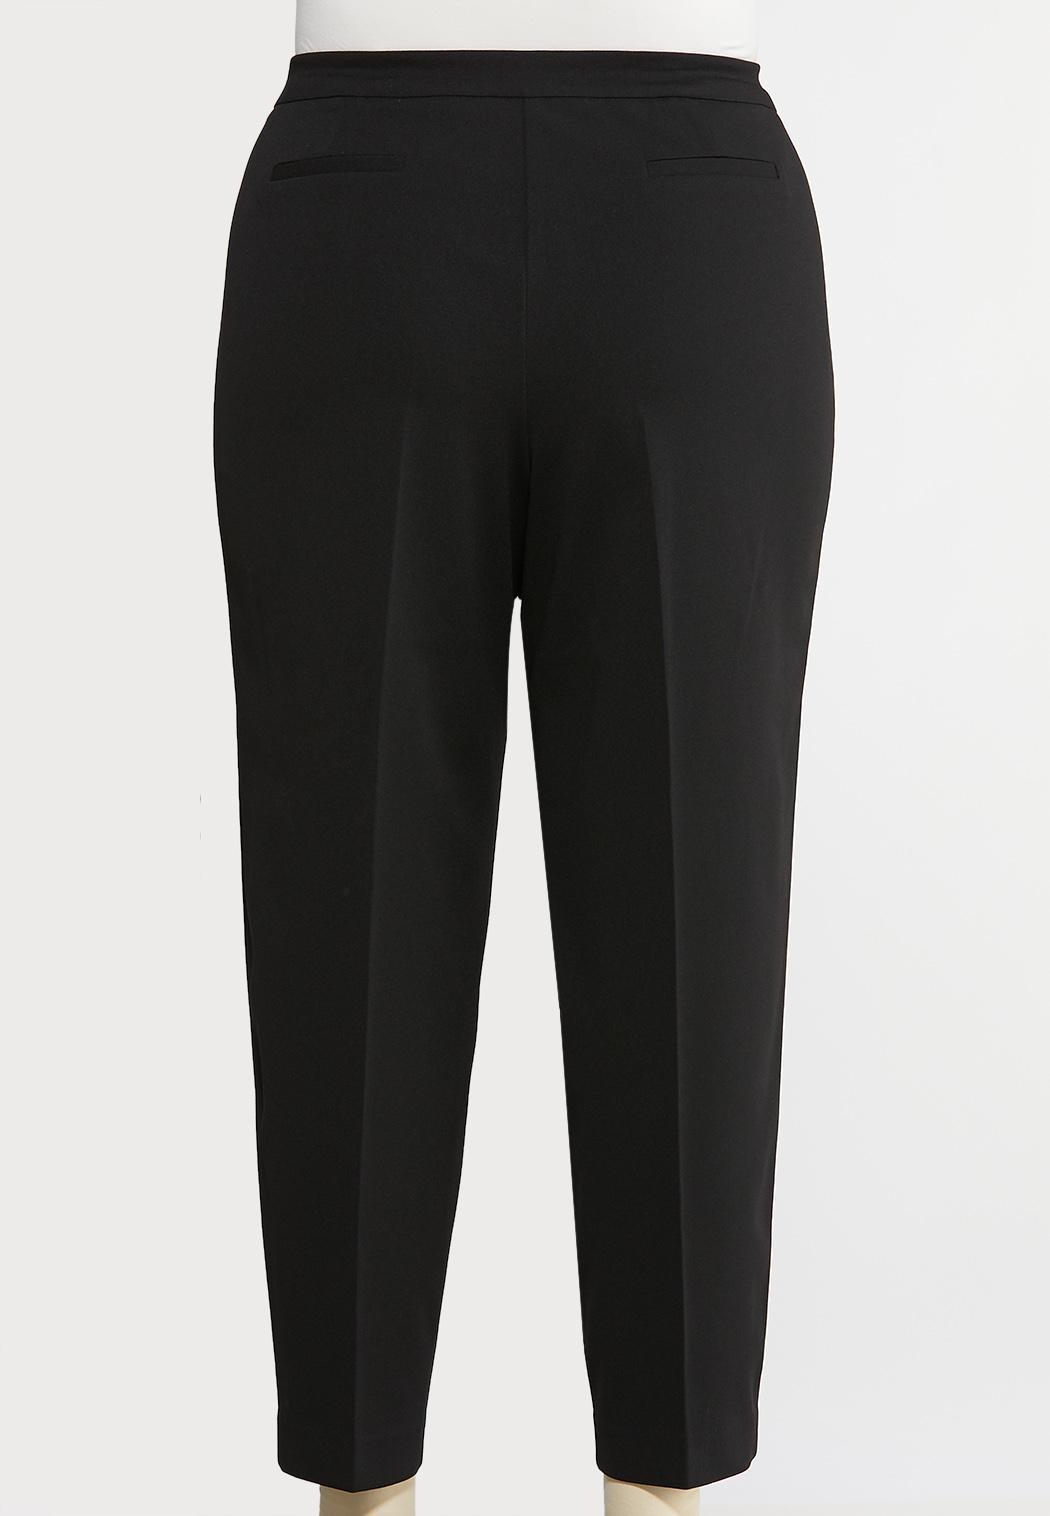 Plus Size Slim Leg Dressy Knit Pants (Item #43892495)